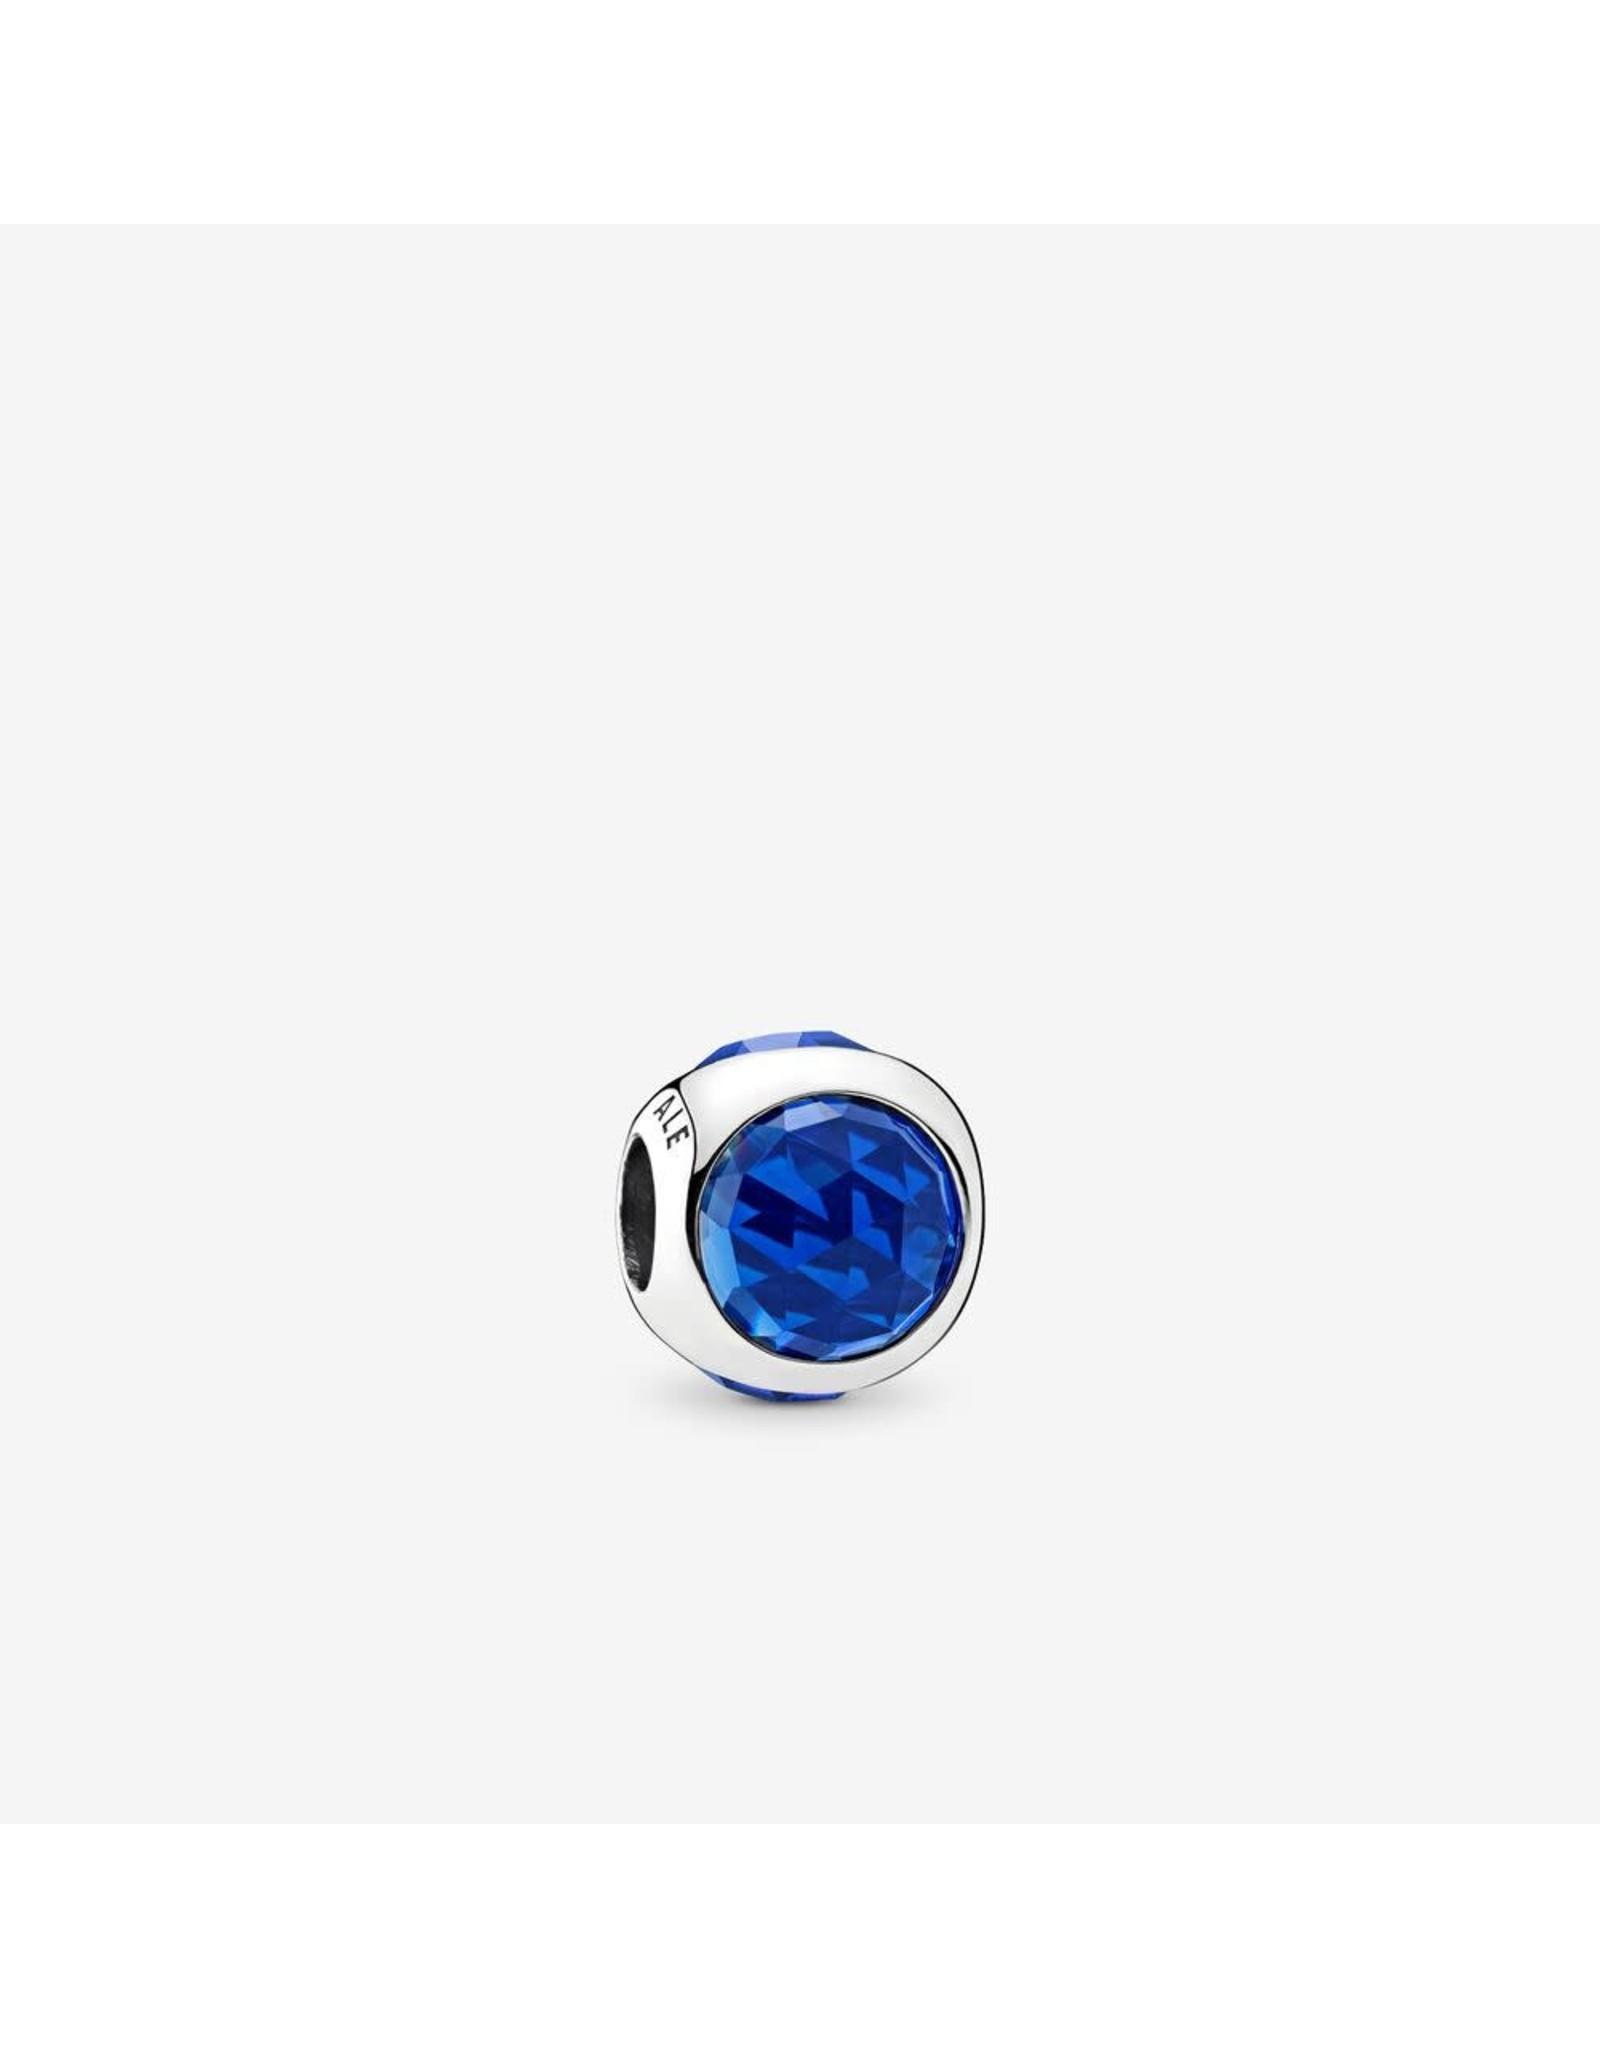 Pandora Pandora Charm, Radiant Droplet, Royal Blue Crystals